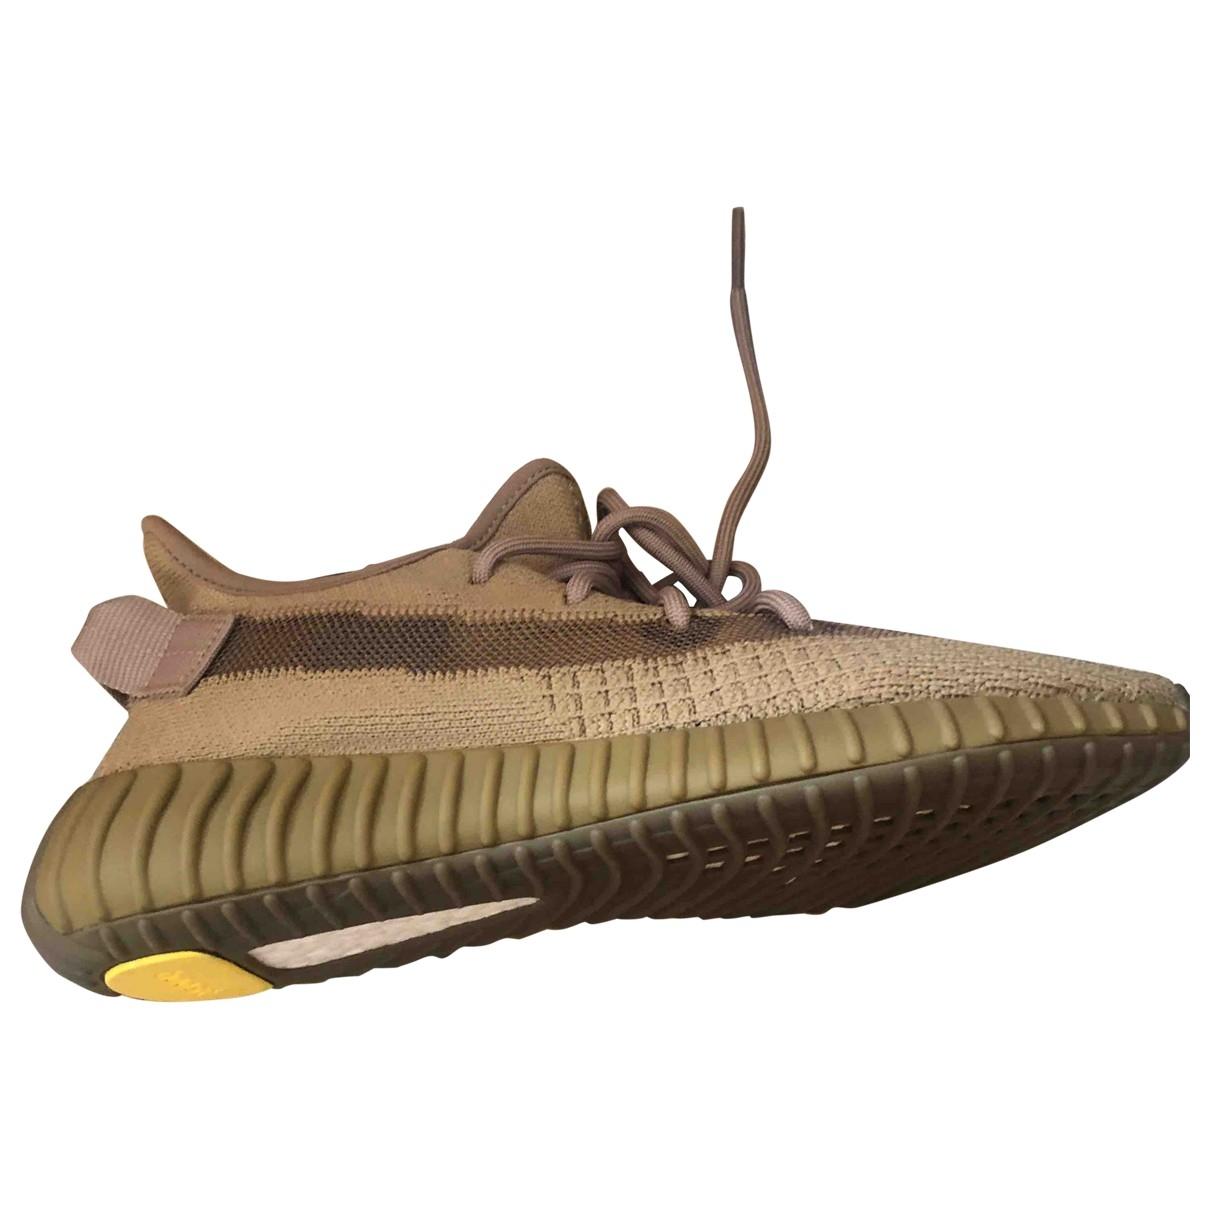 Yeezy X Adidas - Baskets Boost 350 V2 pour homme en toile - marron